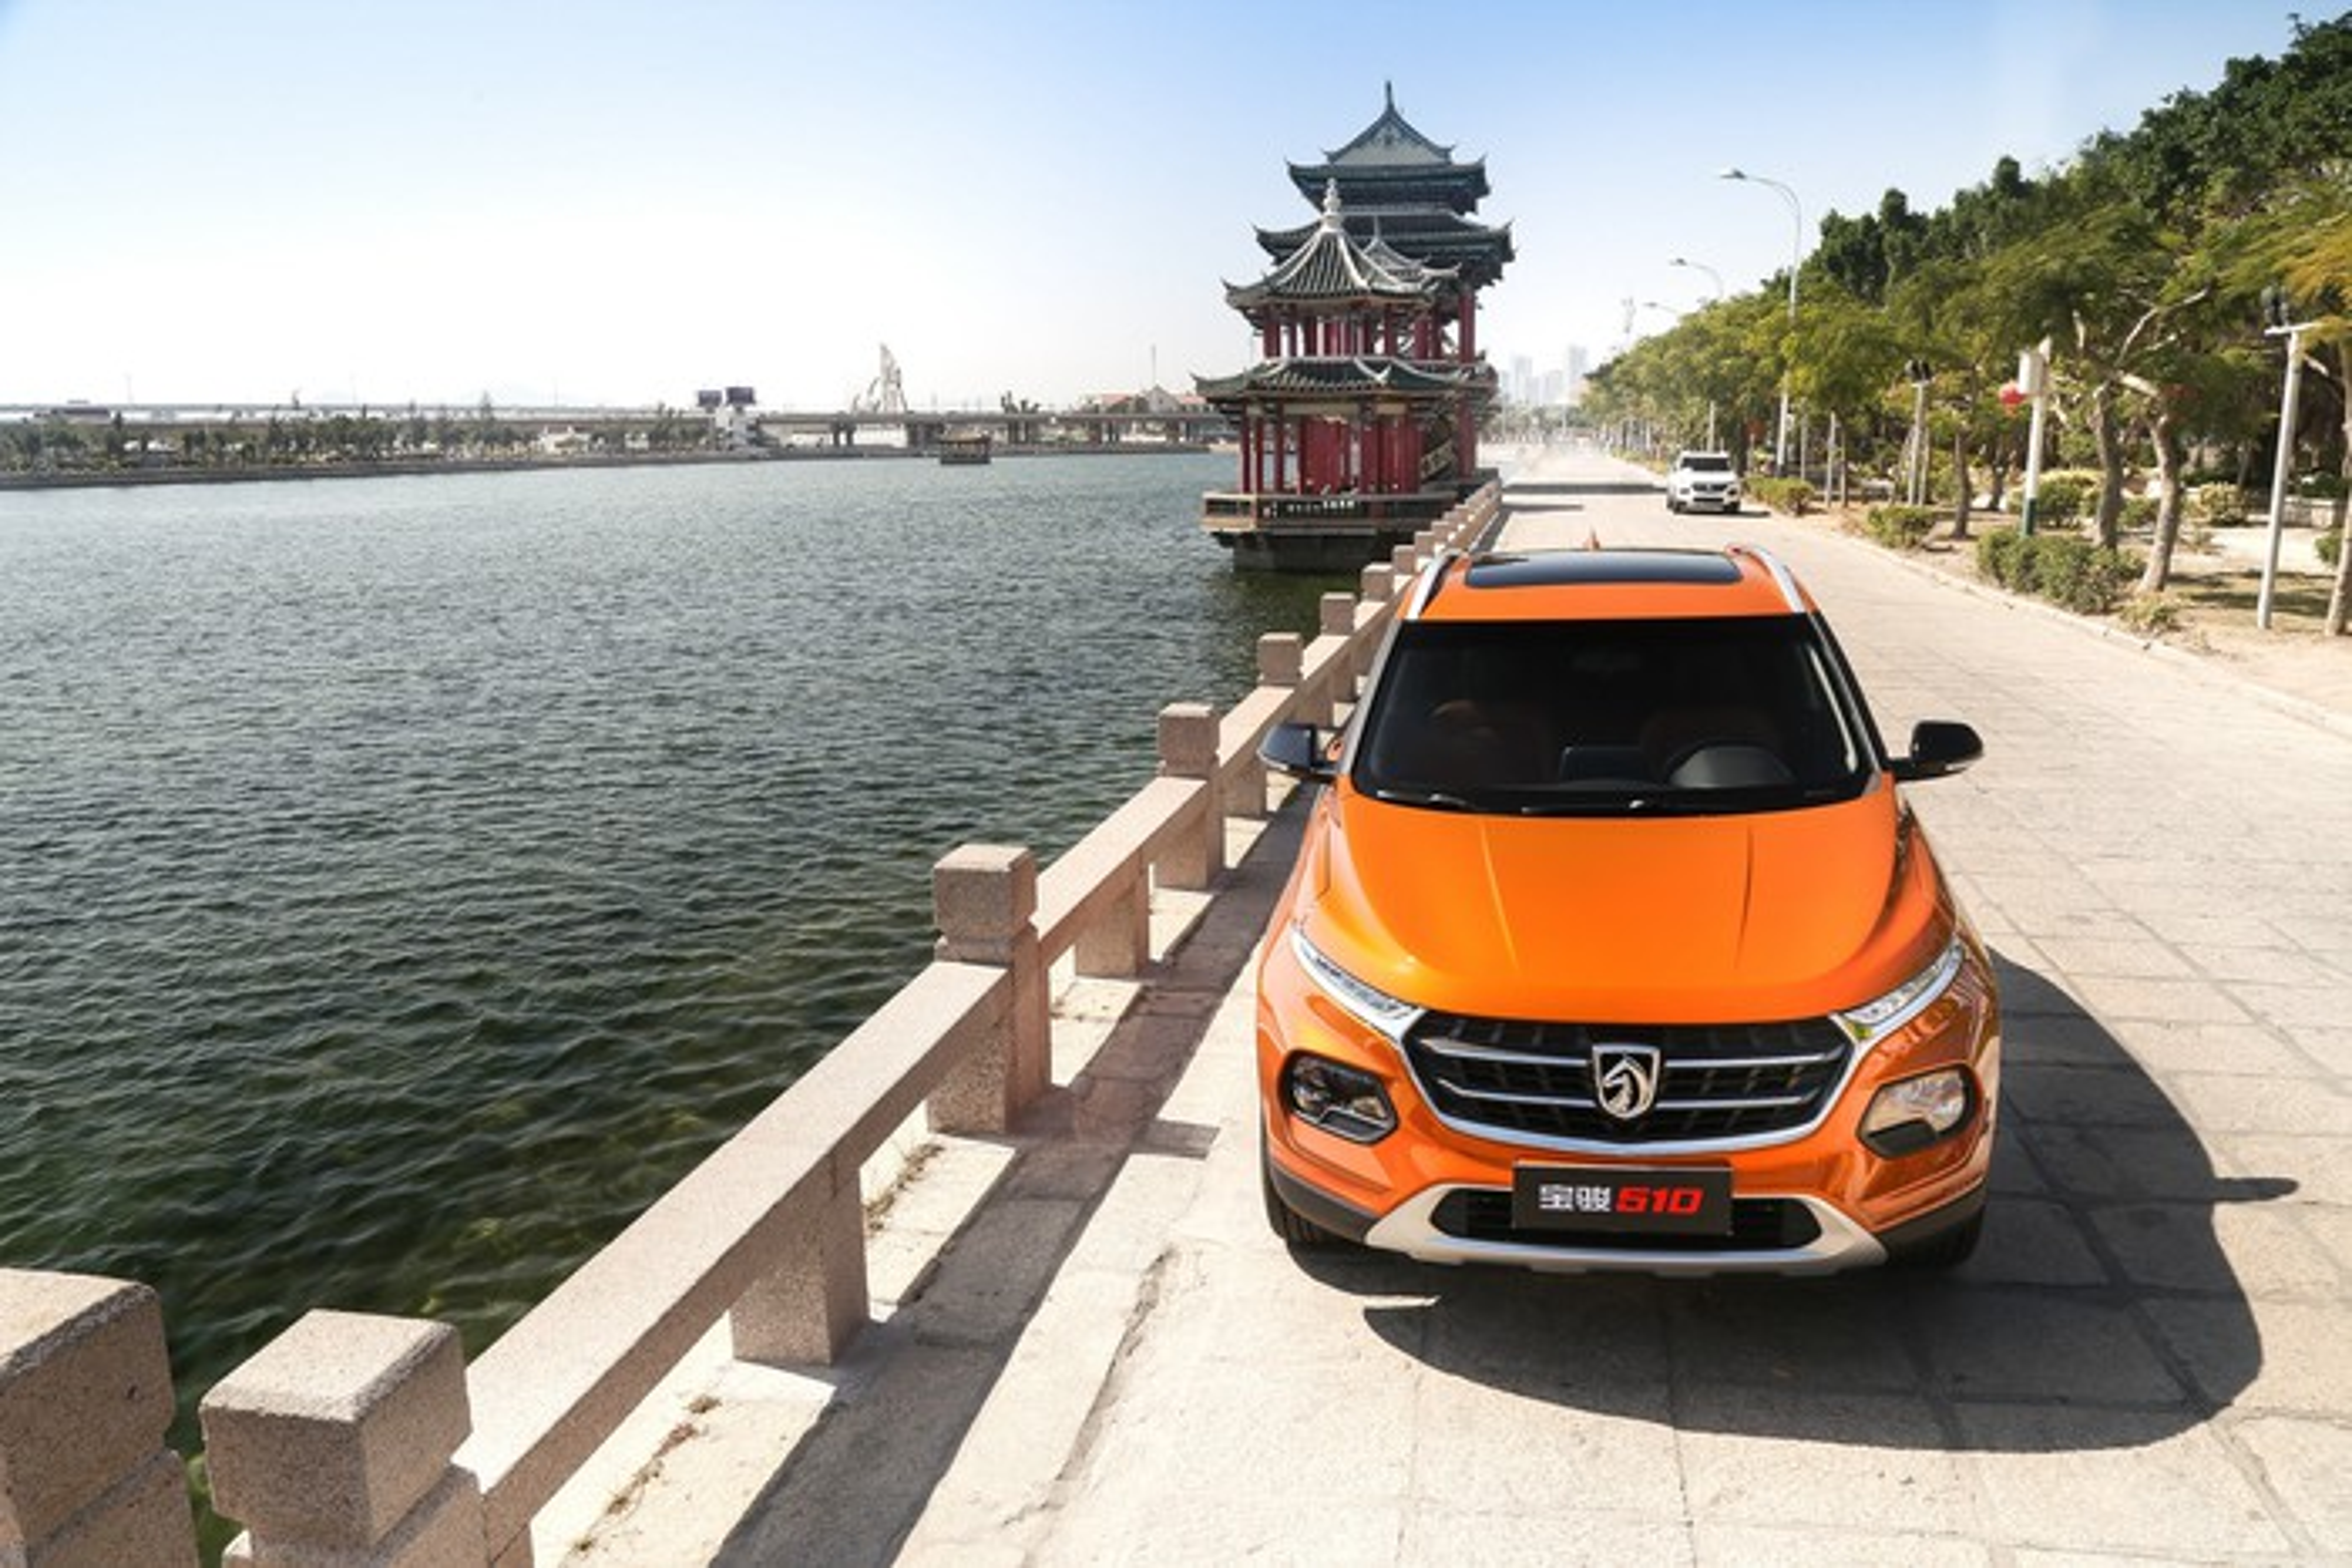 An orange Baojun 510, a small SUV, parked next to a river.